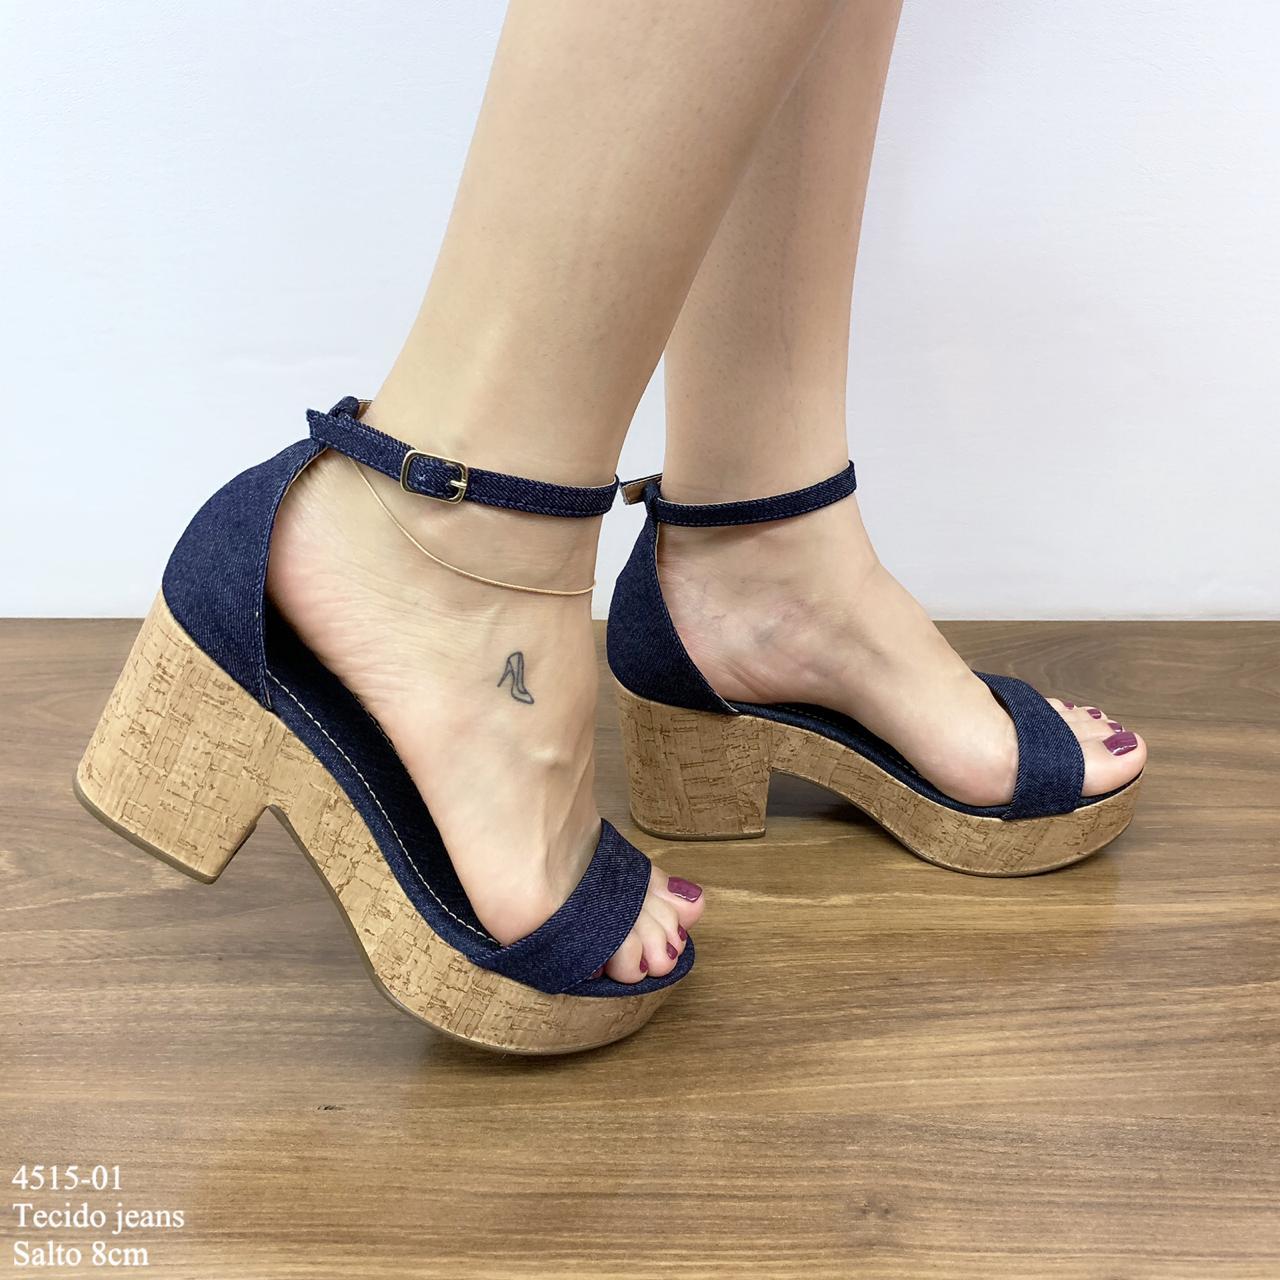 Sandália Anabela Tecido Jeans | D-4515-01